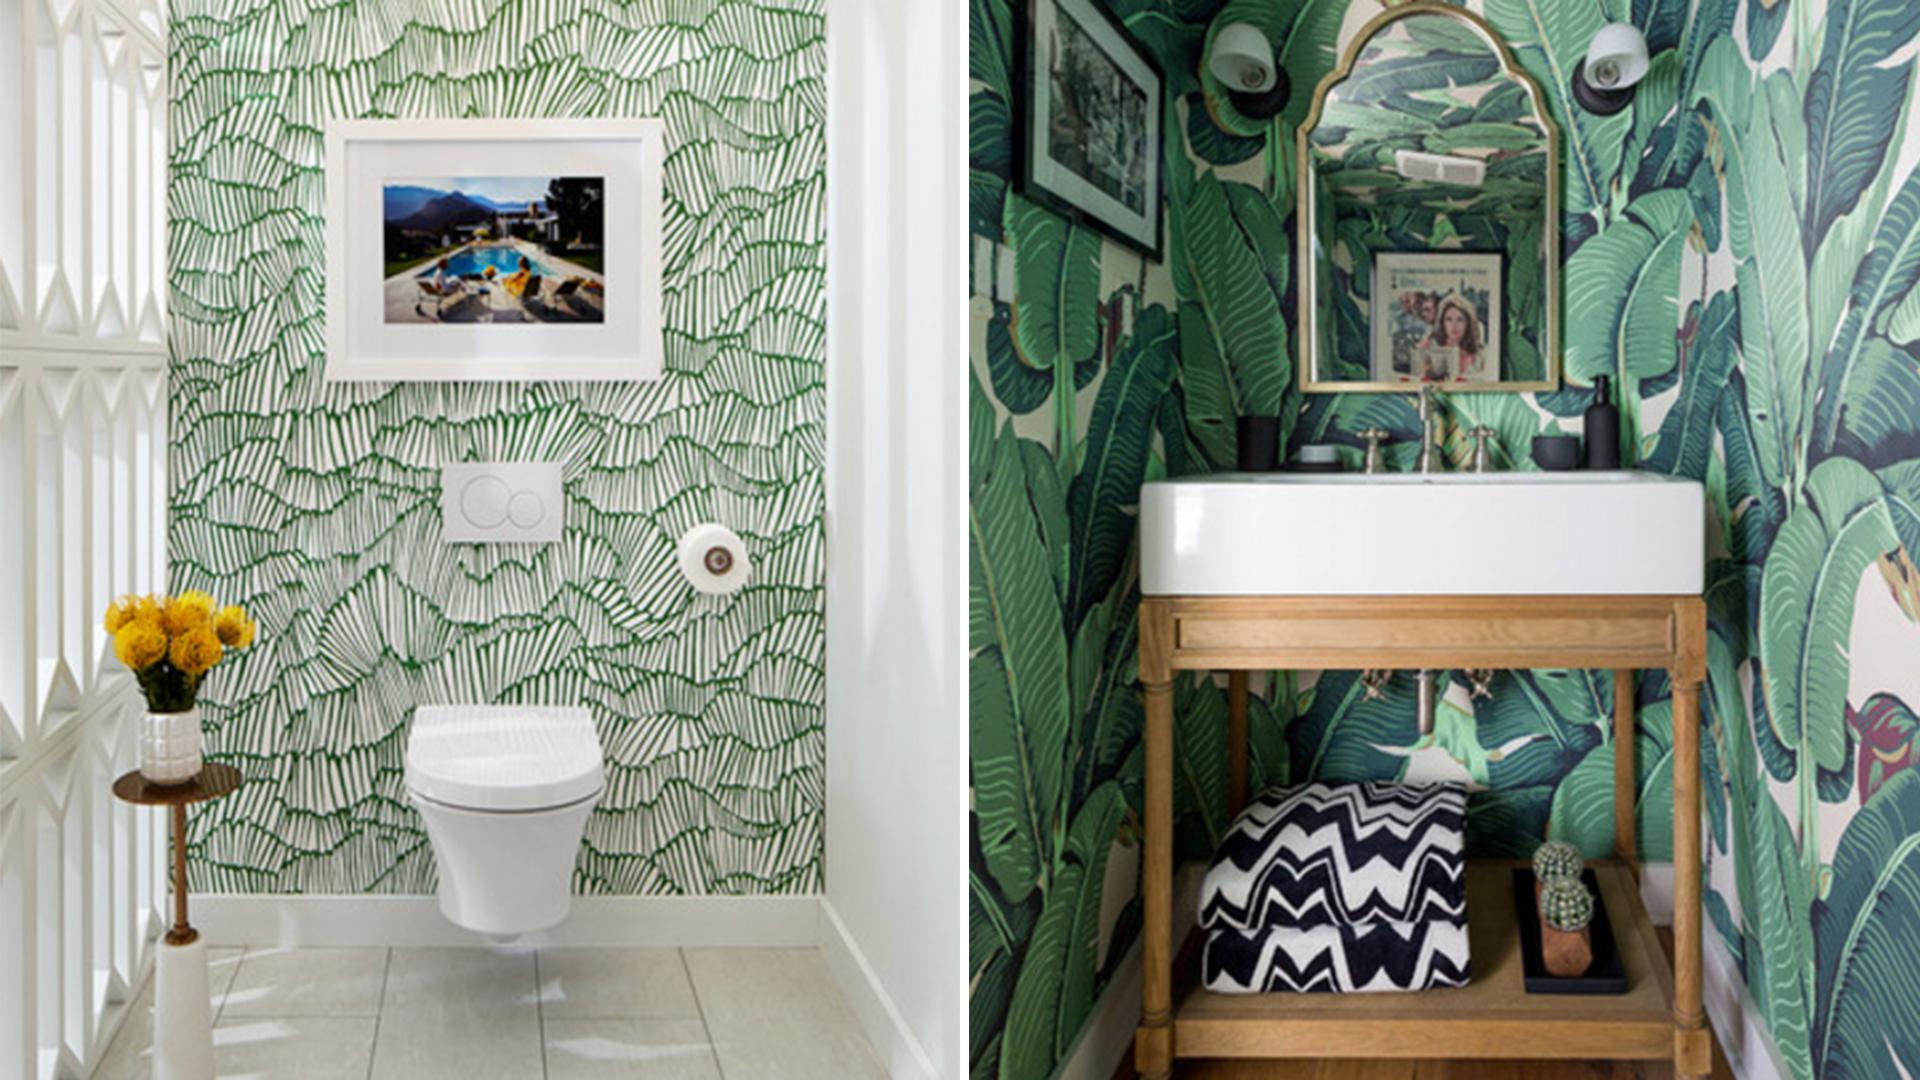 Design tricks that can make a small bathroom feel bigger